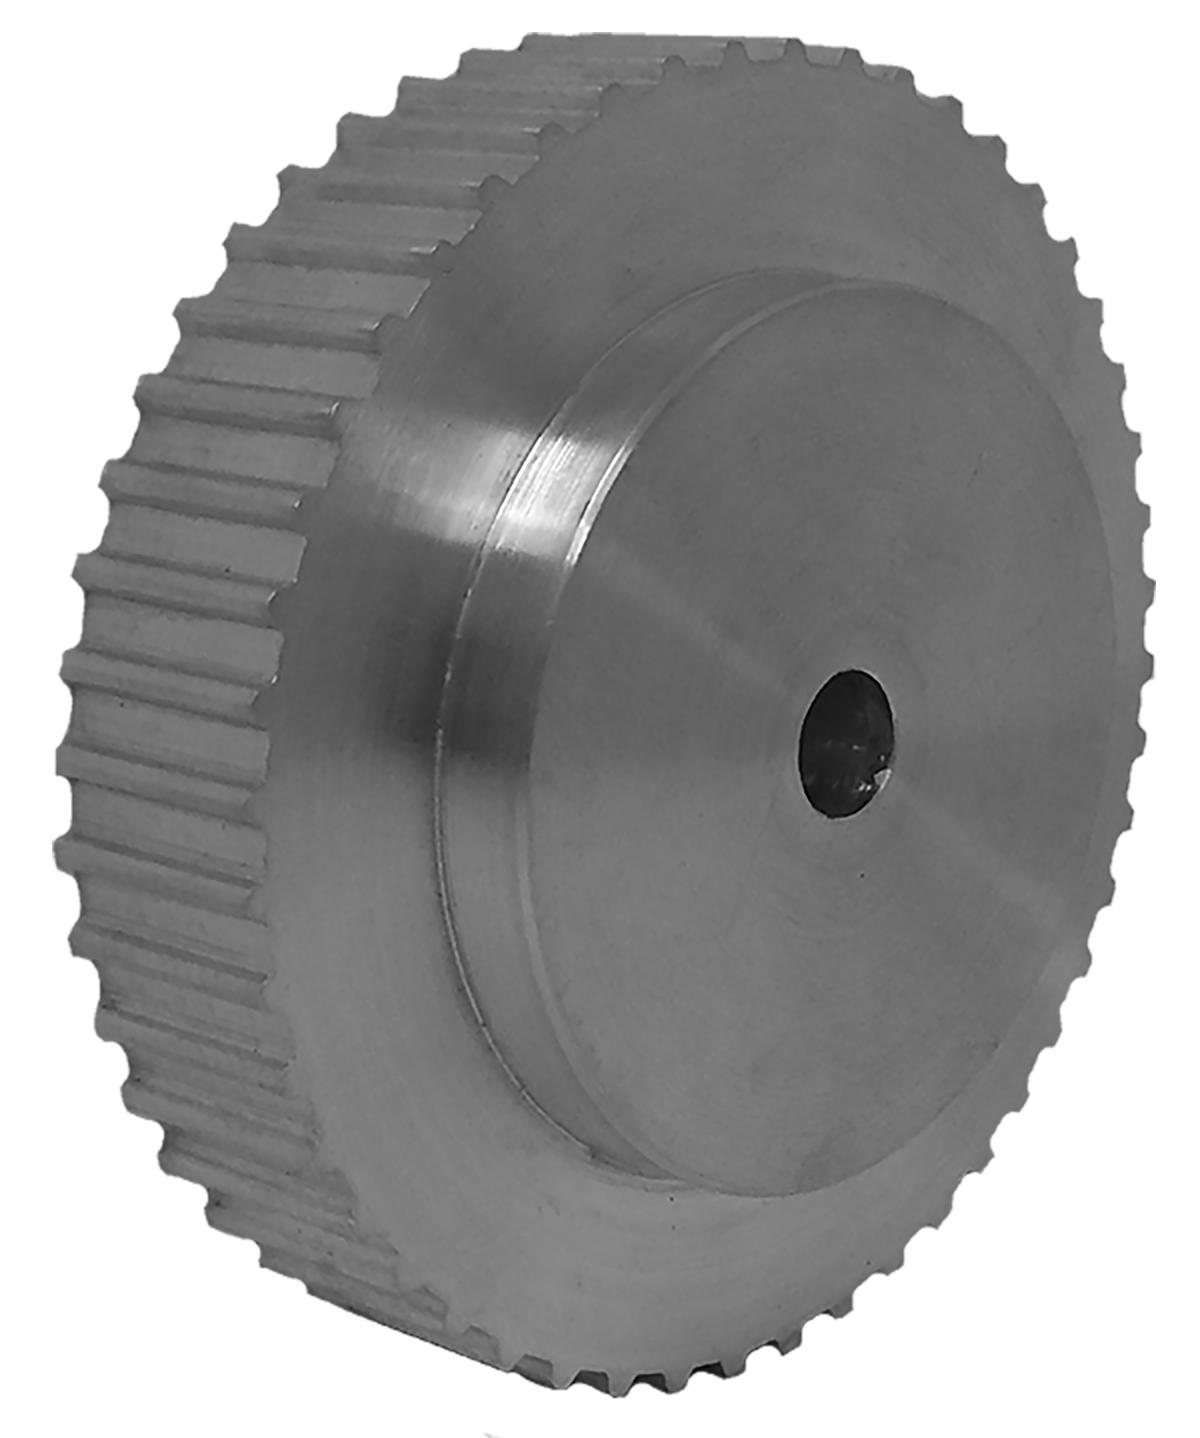 21AT5/48-0 - Aluminum Metric Pulleys